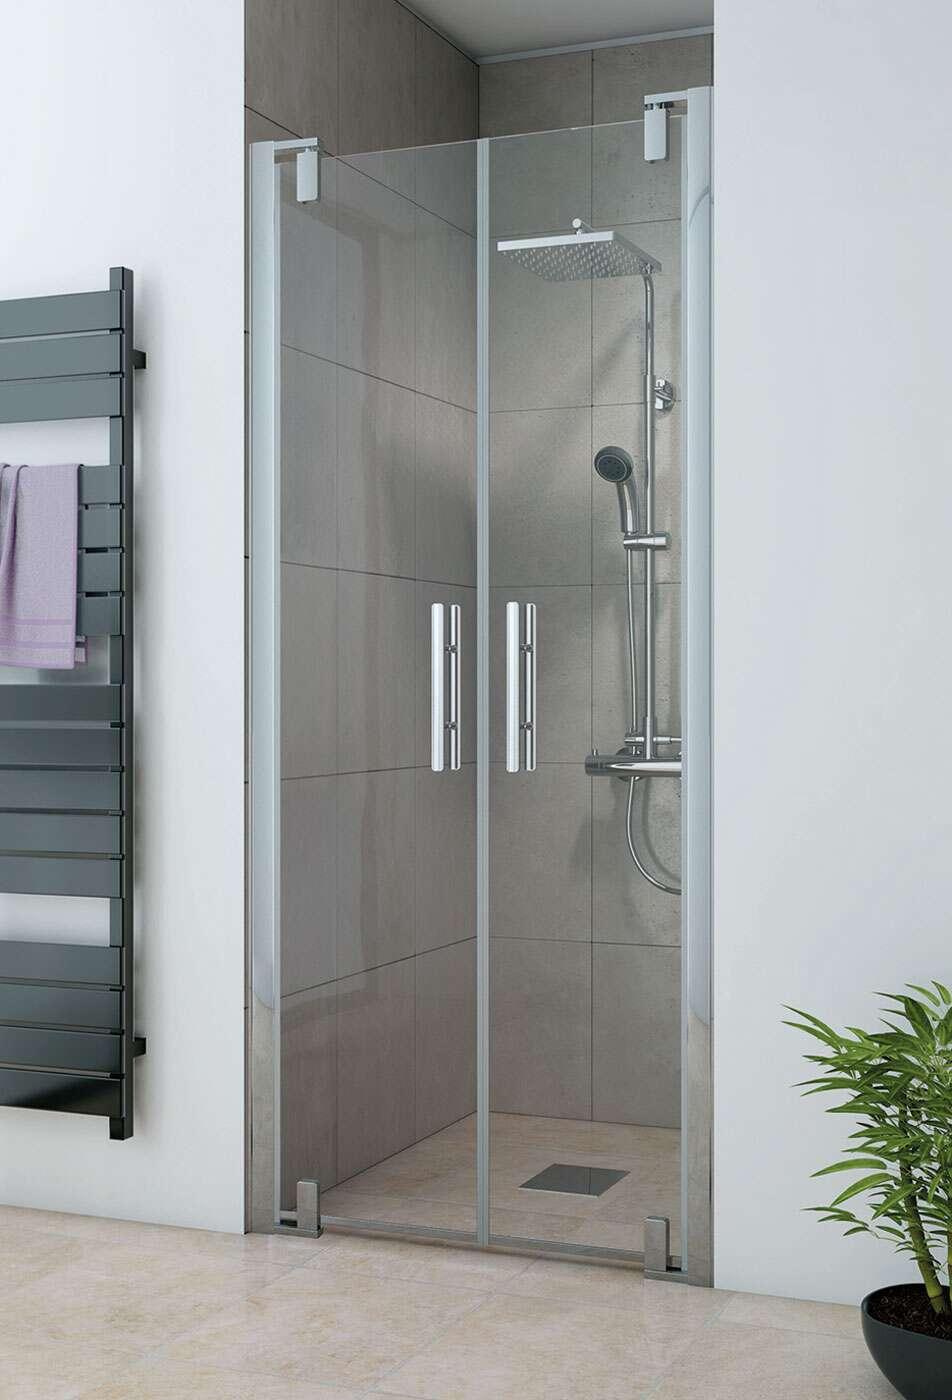 breuer dusche europa design pendelt r f r nische. Black Bedroom Furniture Sets. Home Design Ideas